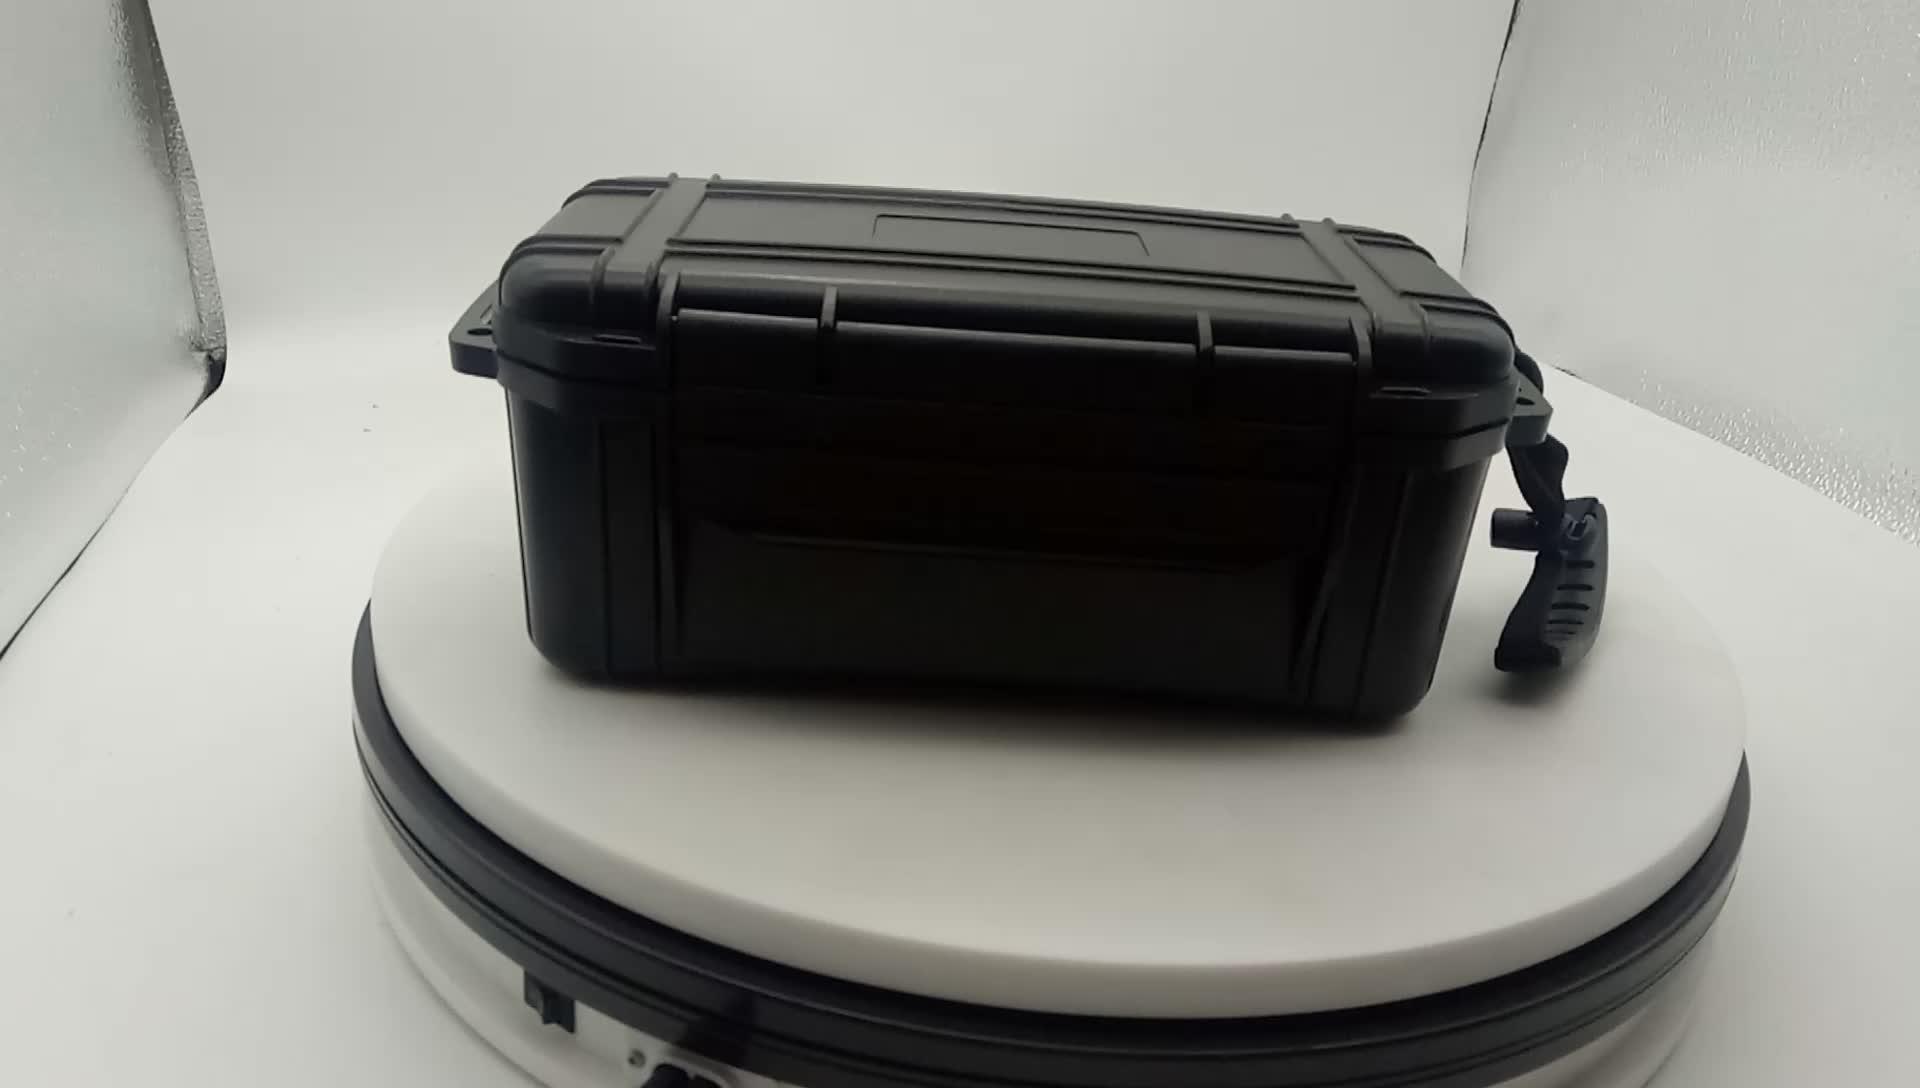 Air tight anti crush กลิ่นซิการ์กล่อง 15ct travel humidor สีดำกลางแจ้ง OEM โลโก้ม